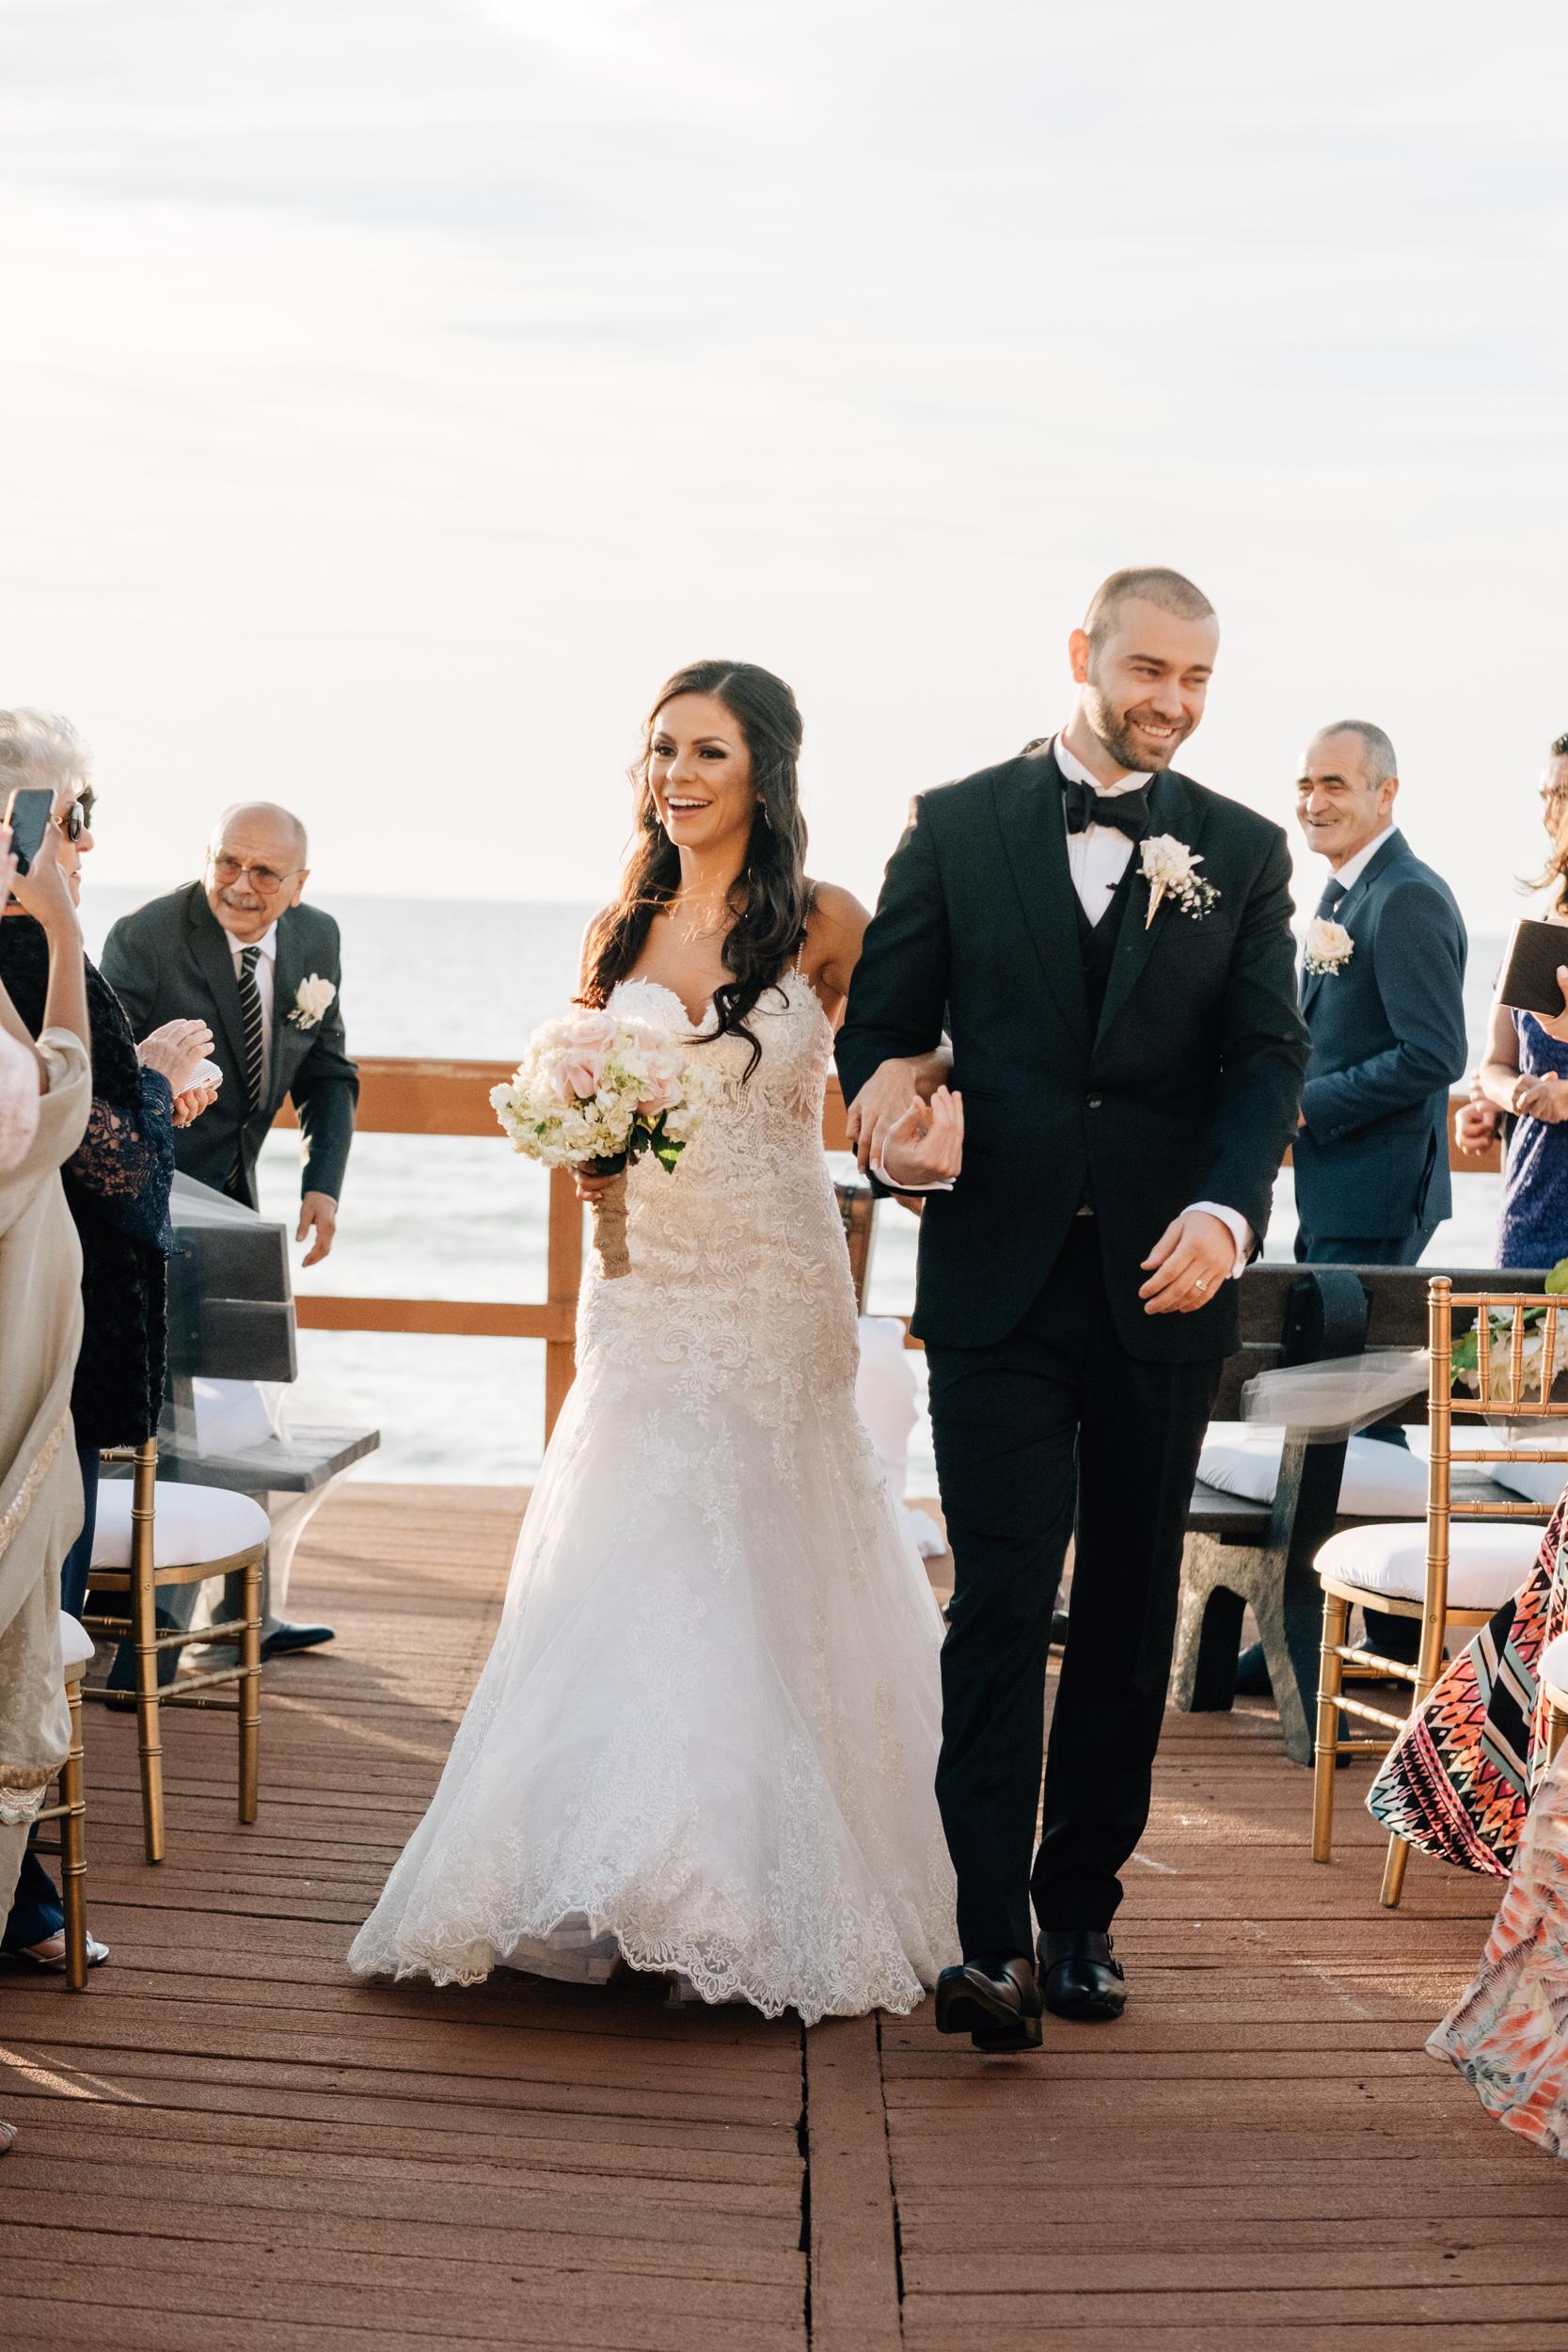 Amethyst Weddings - Georgi and Mariana 066.jpg